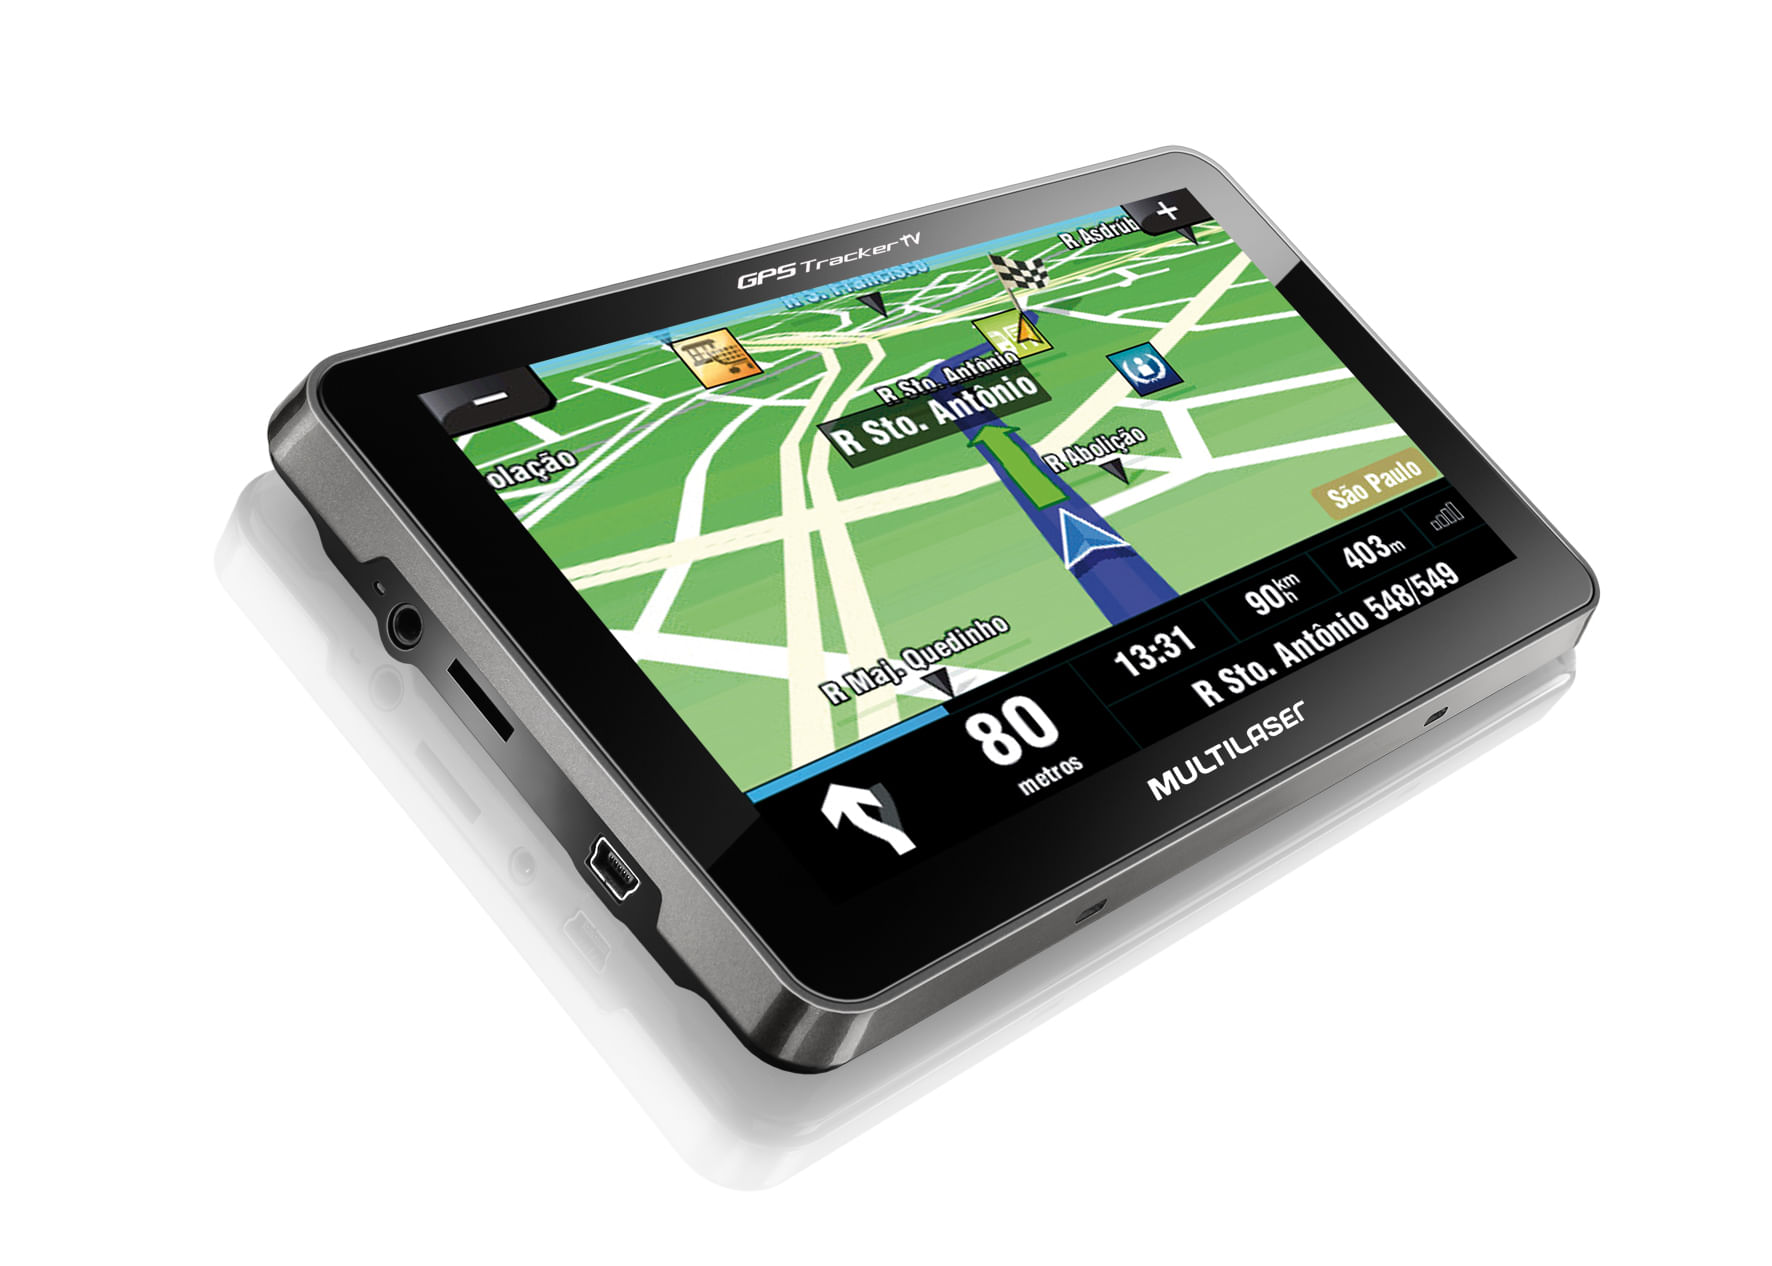 Gps Tracker 2 Multilaser Tela 7,0 com TV Rádio Fm - GP015 GP015